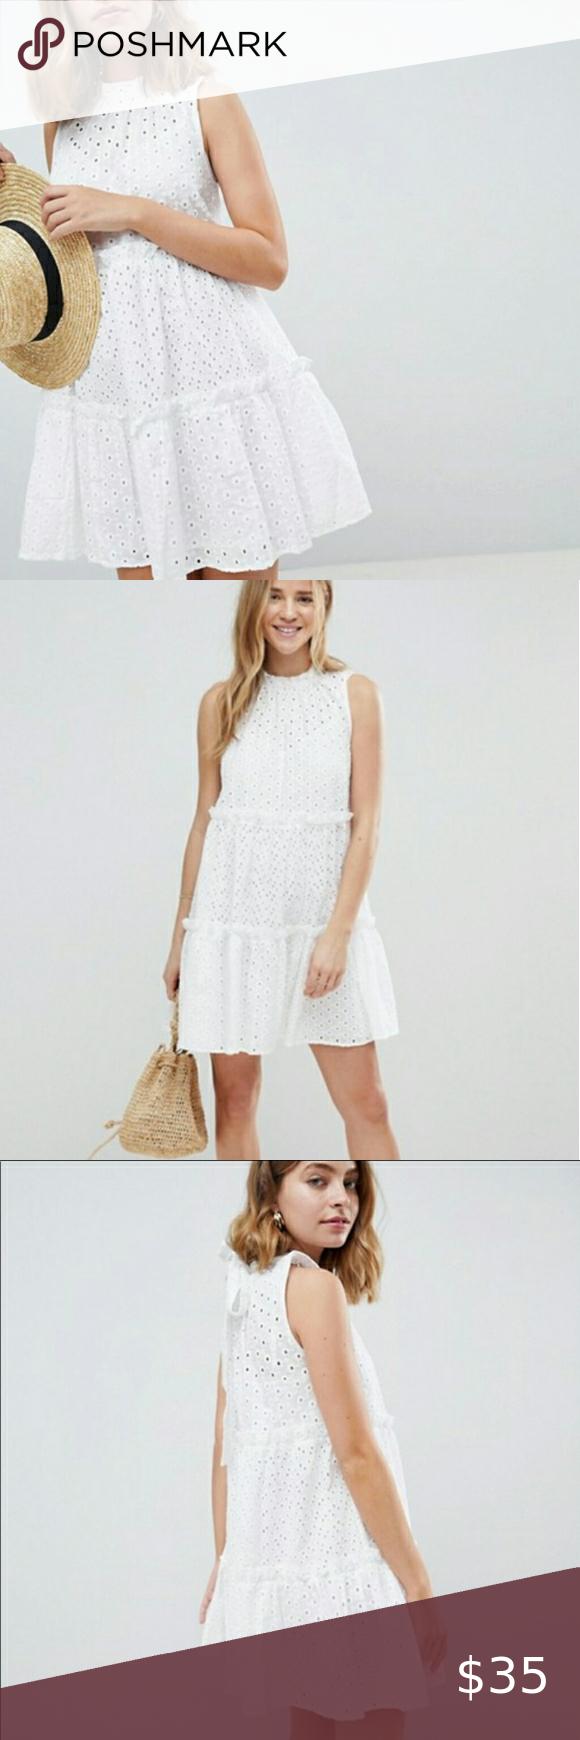 Asos White Broderie Eyelet Lace Trapeze Dress 6 Dresses Trapeze Dress Lace [ 1740 x 580 Pixel ]